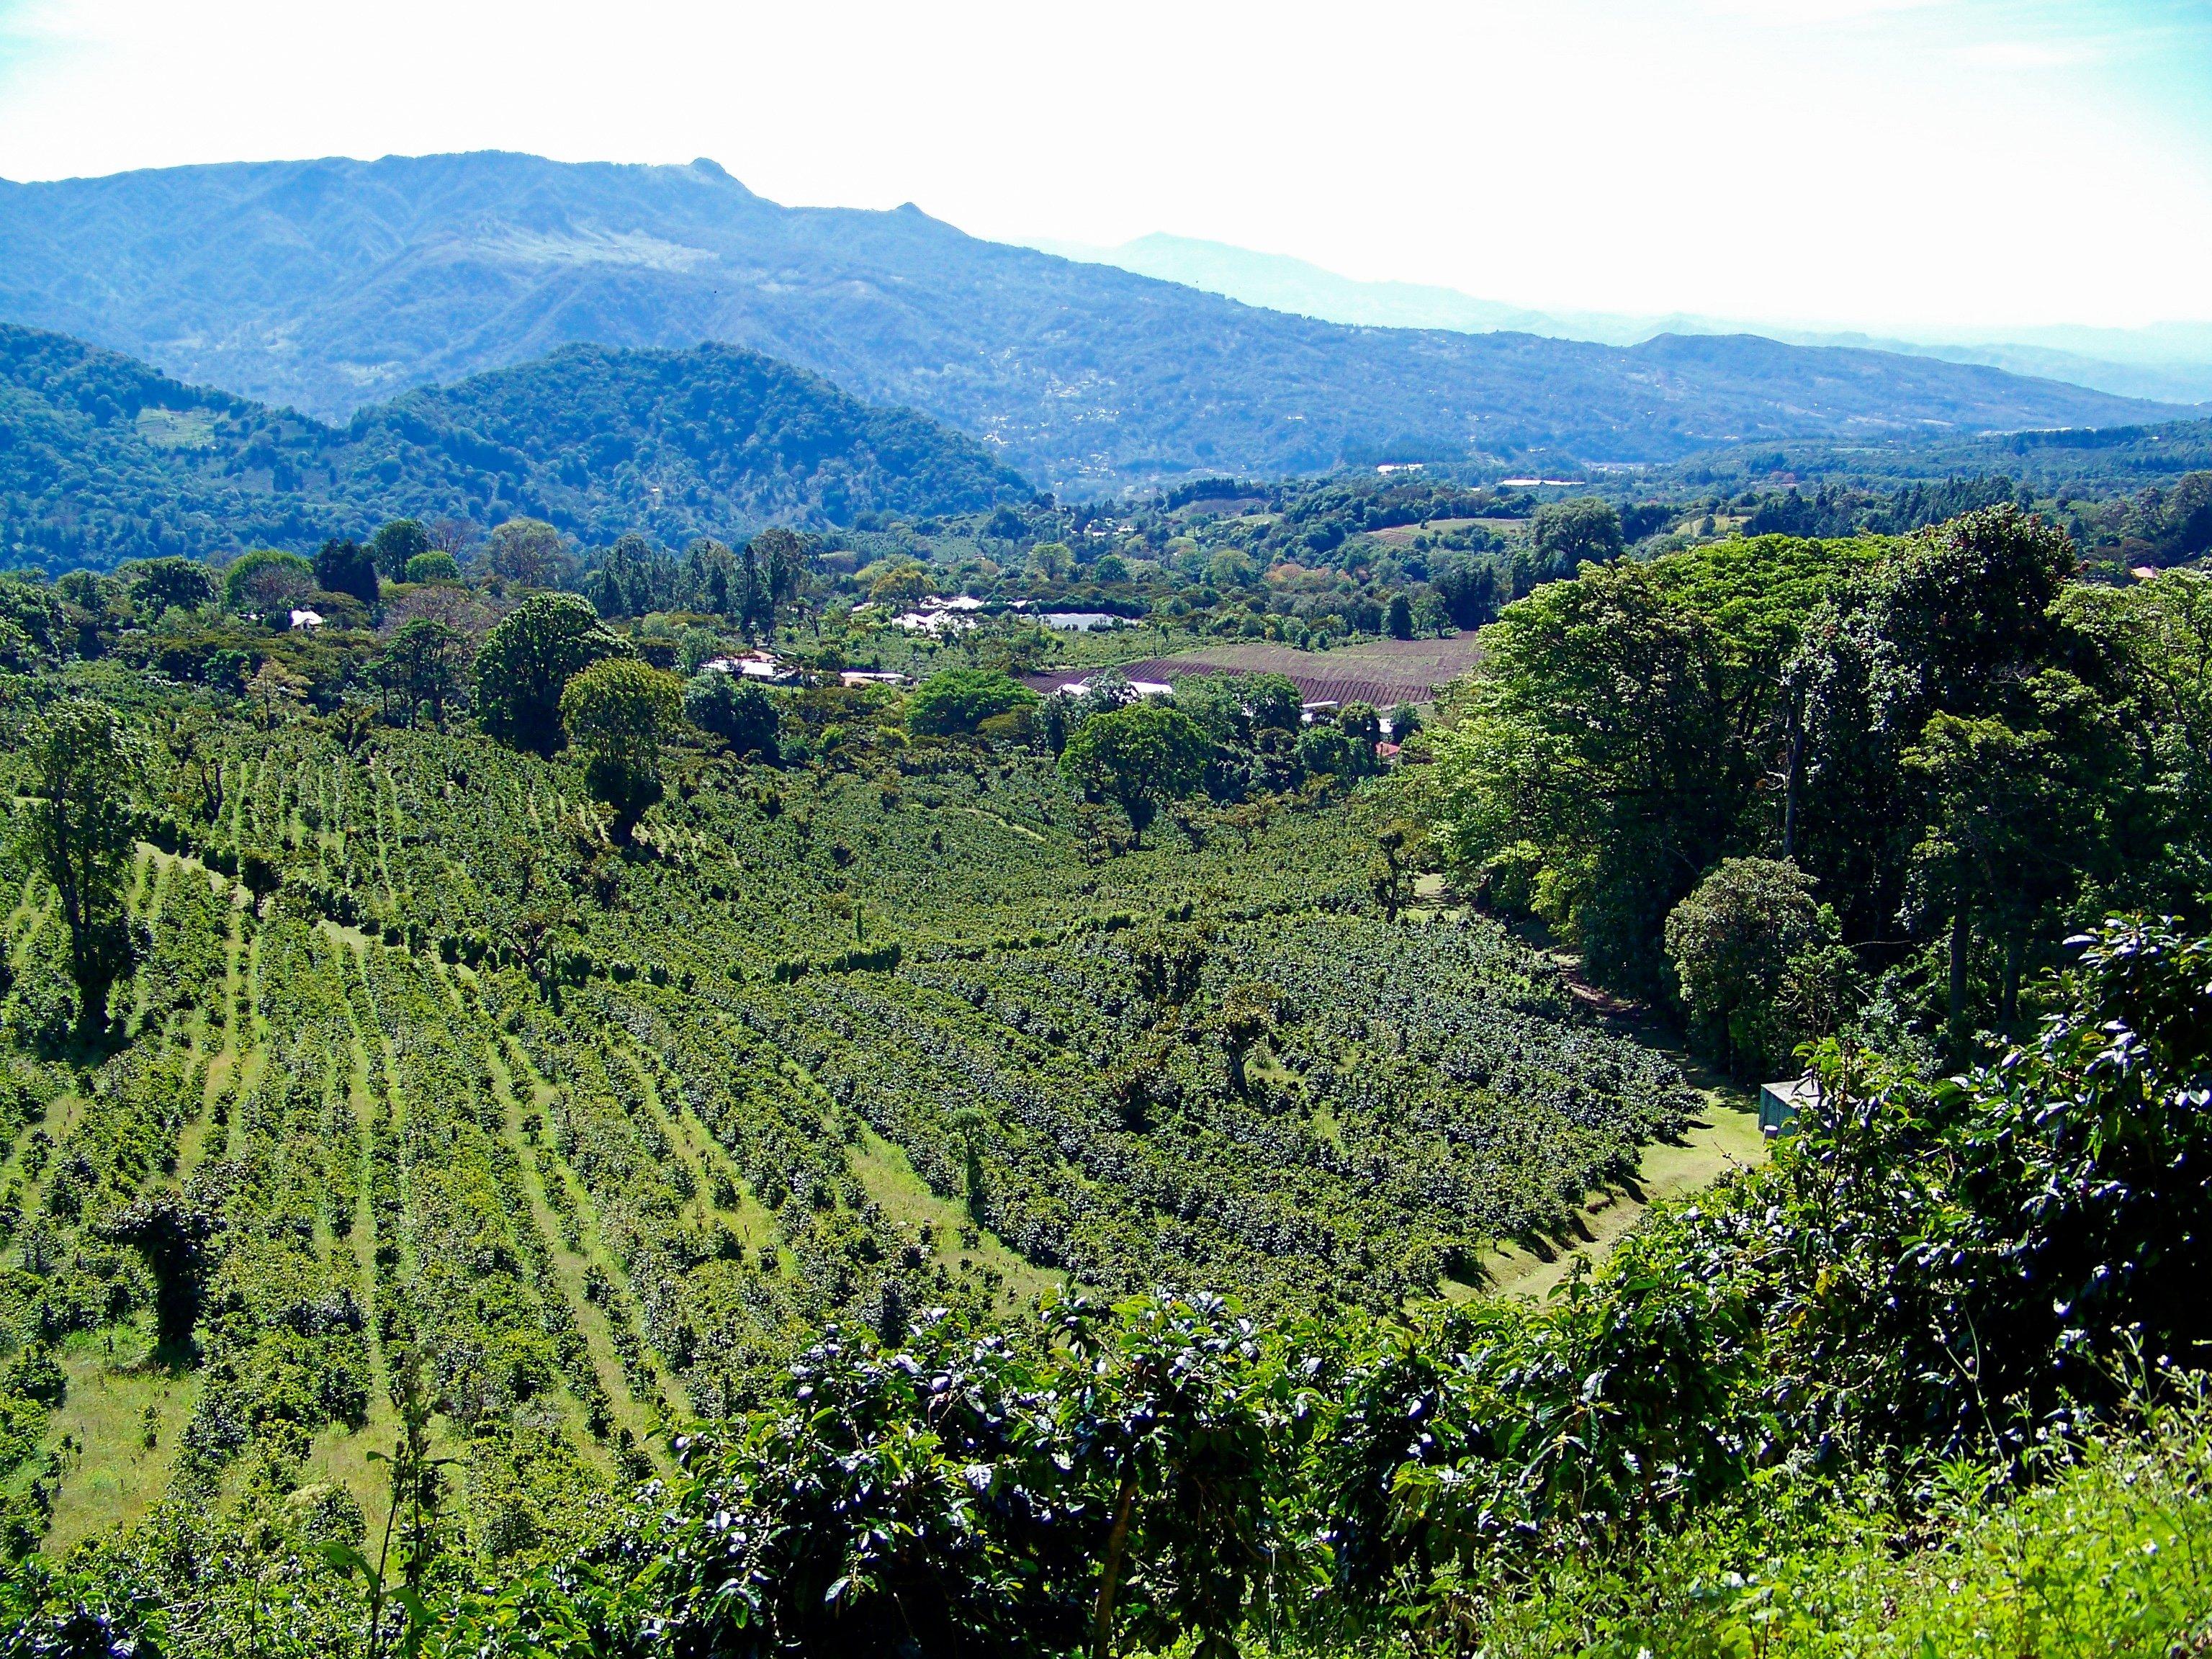 coffee-plantation-in-panama-CE8MFS6-1